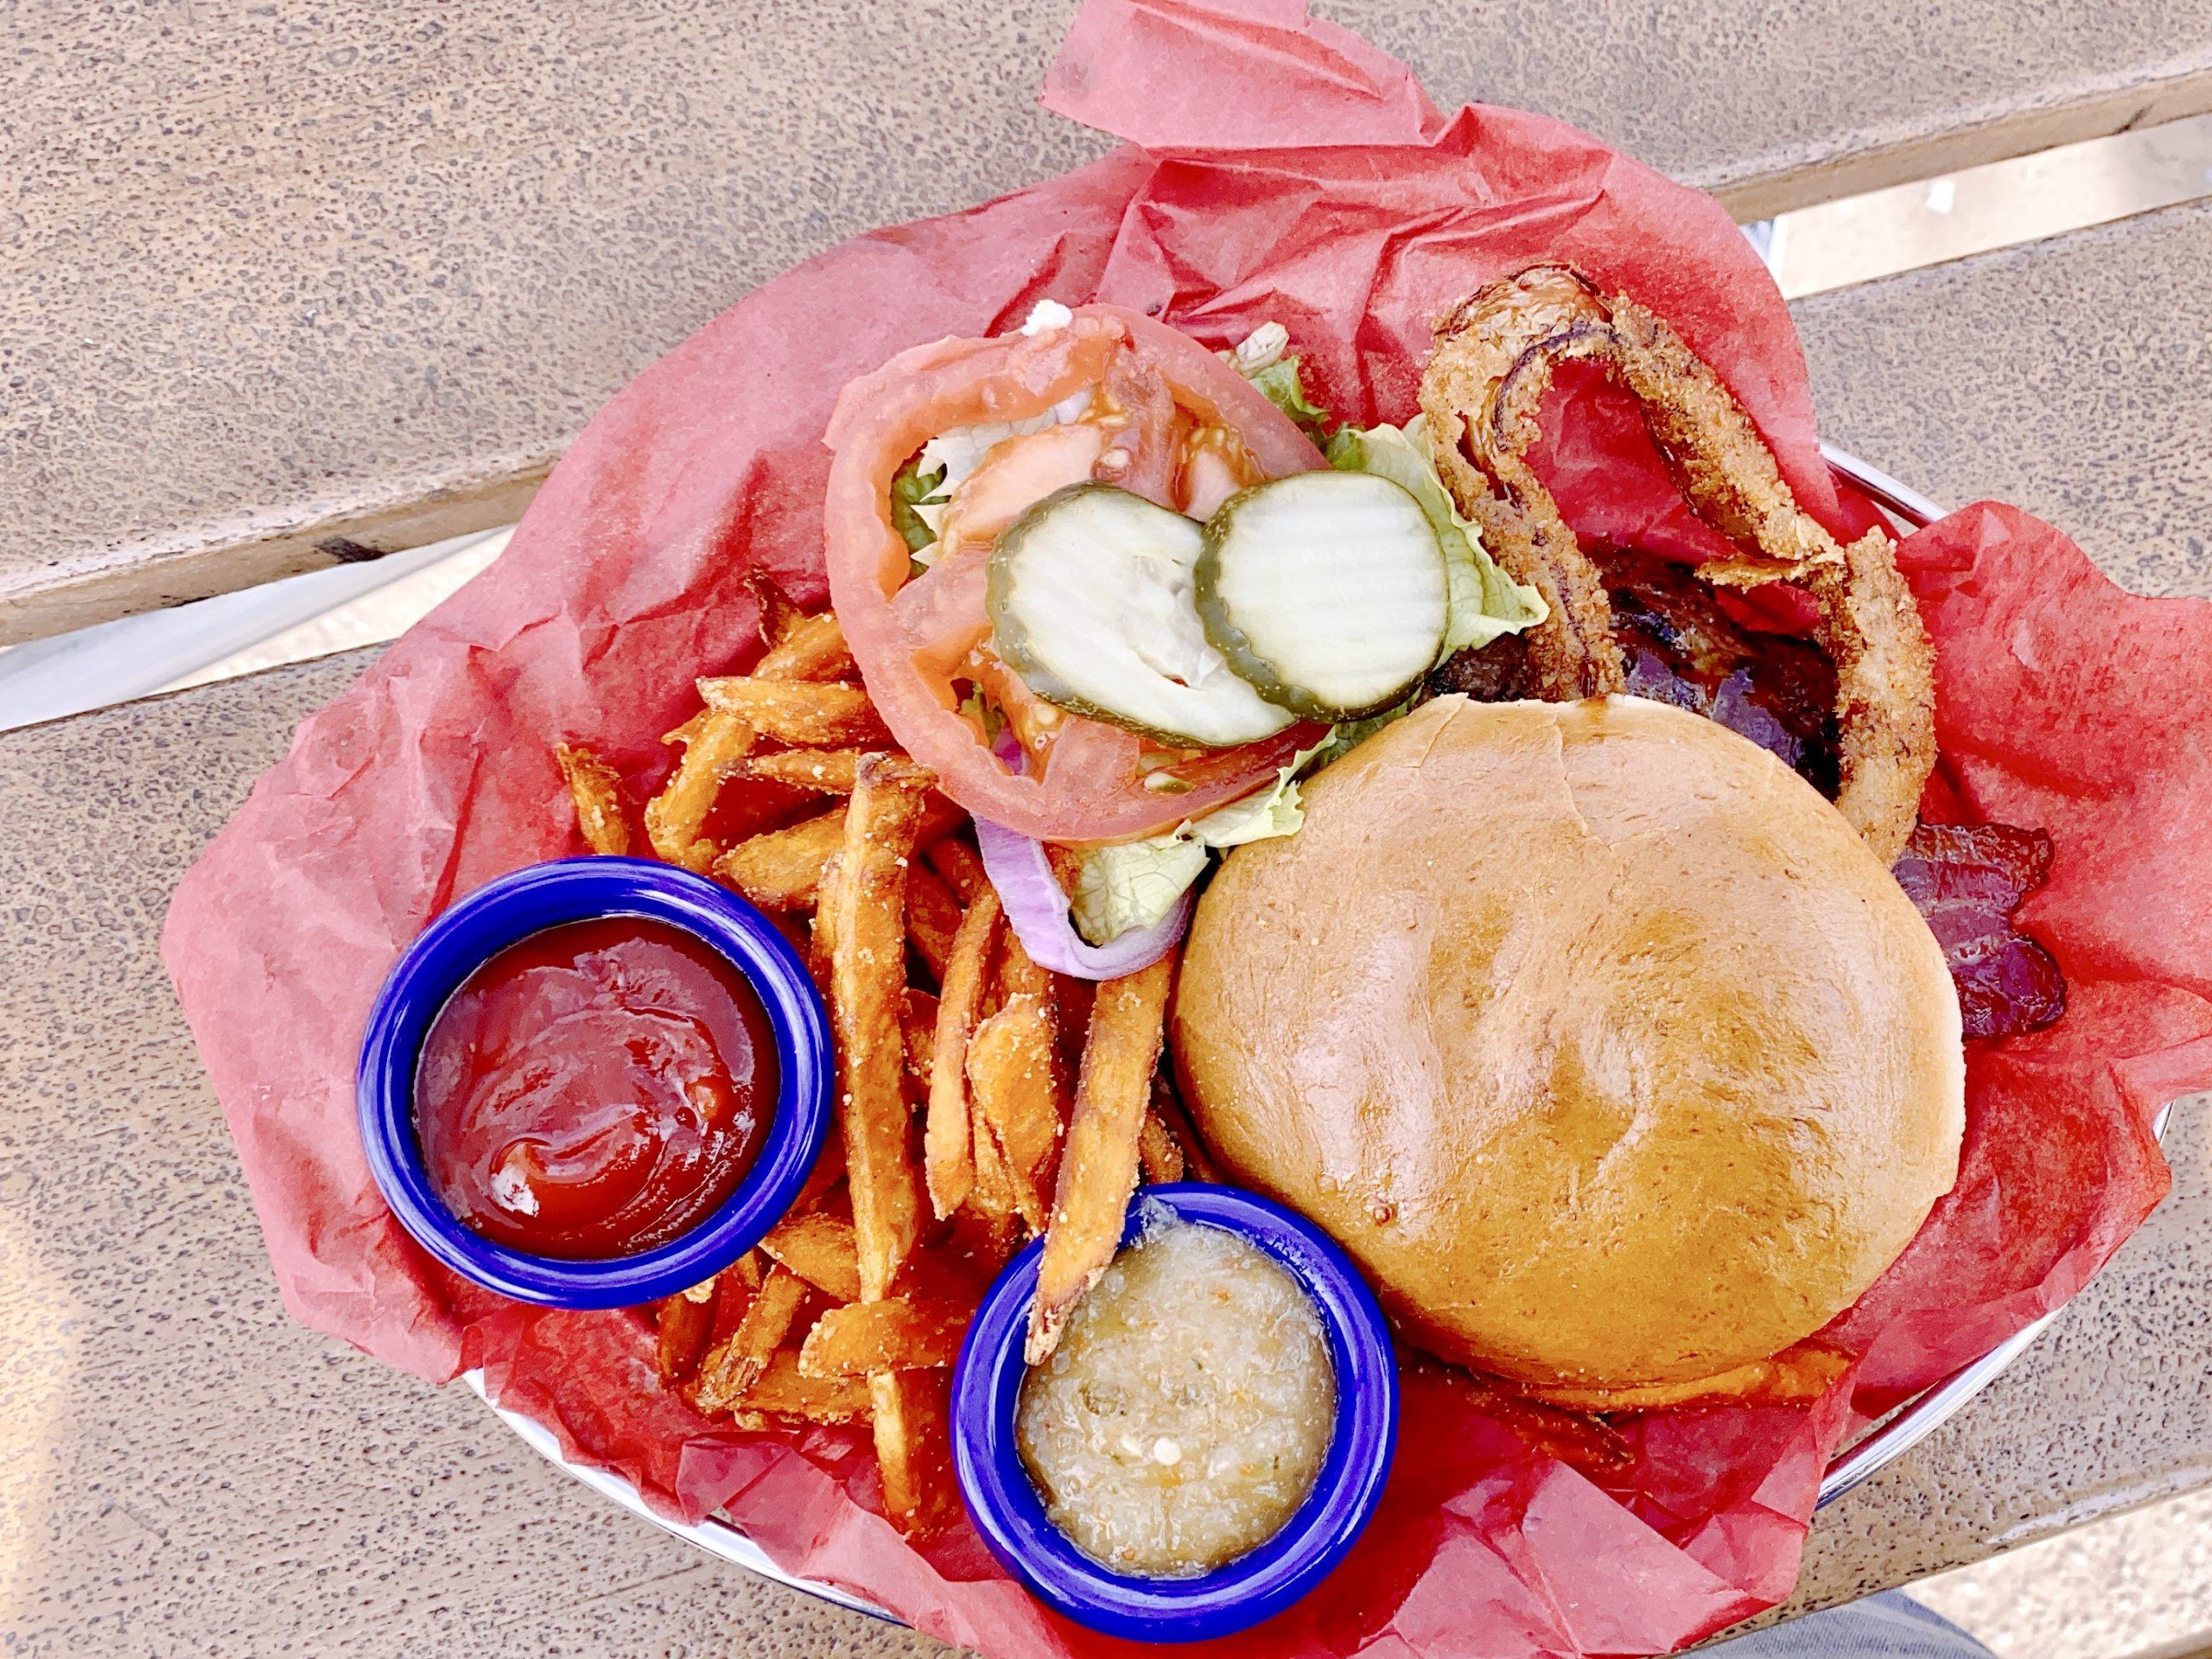 Burger and fries served at Joe's Farm House in Gilbert, Arizona